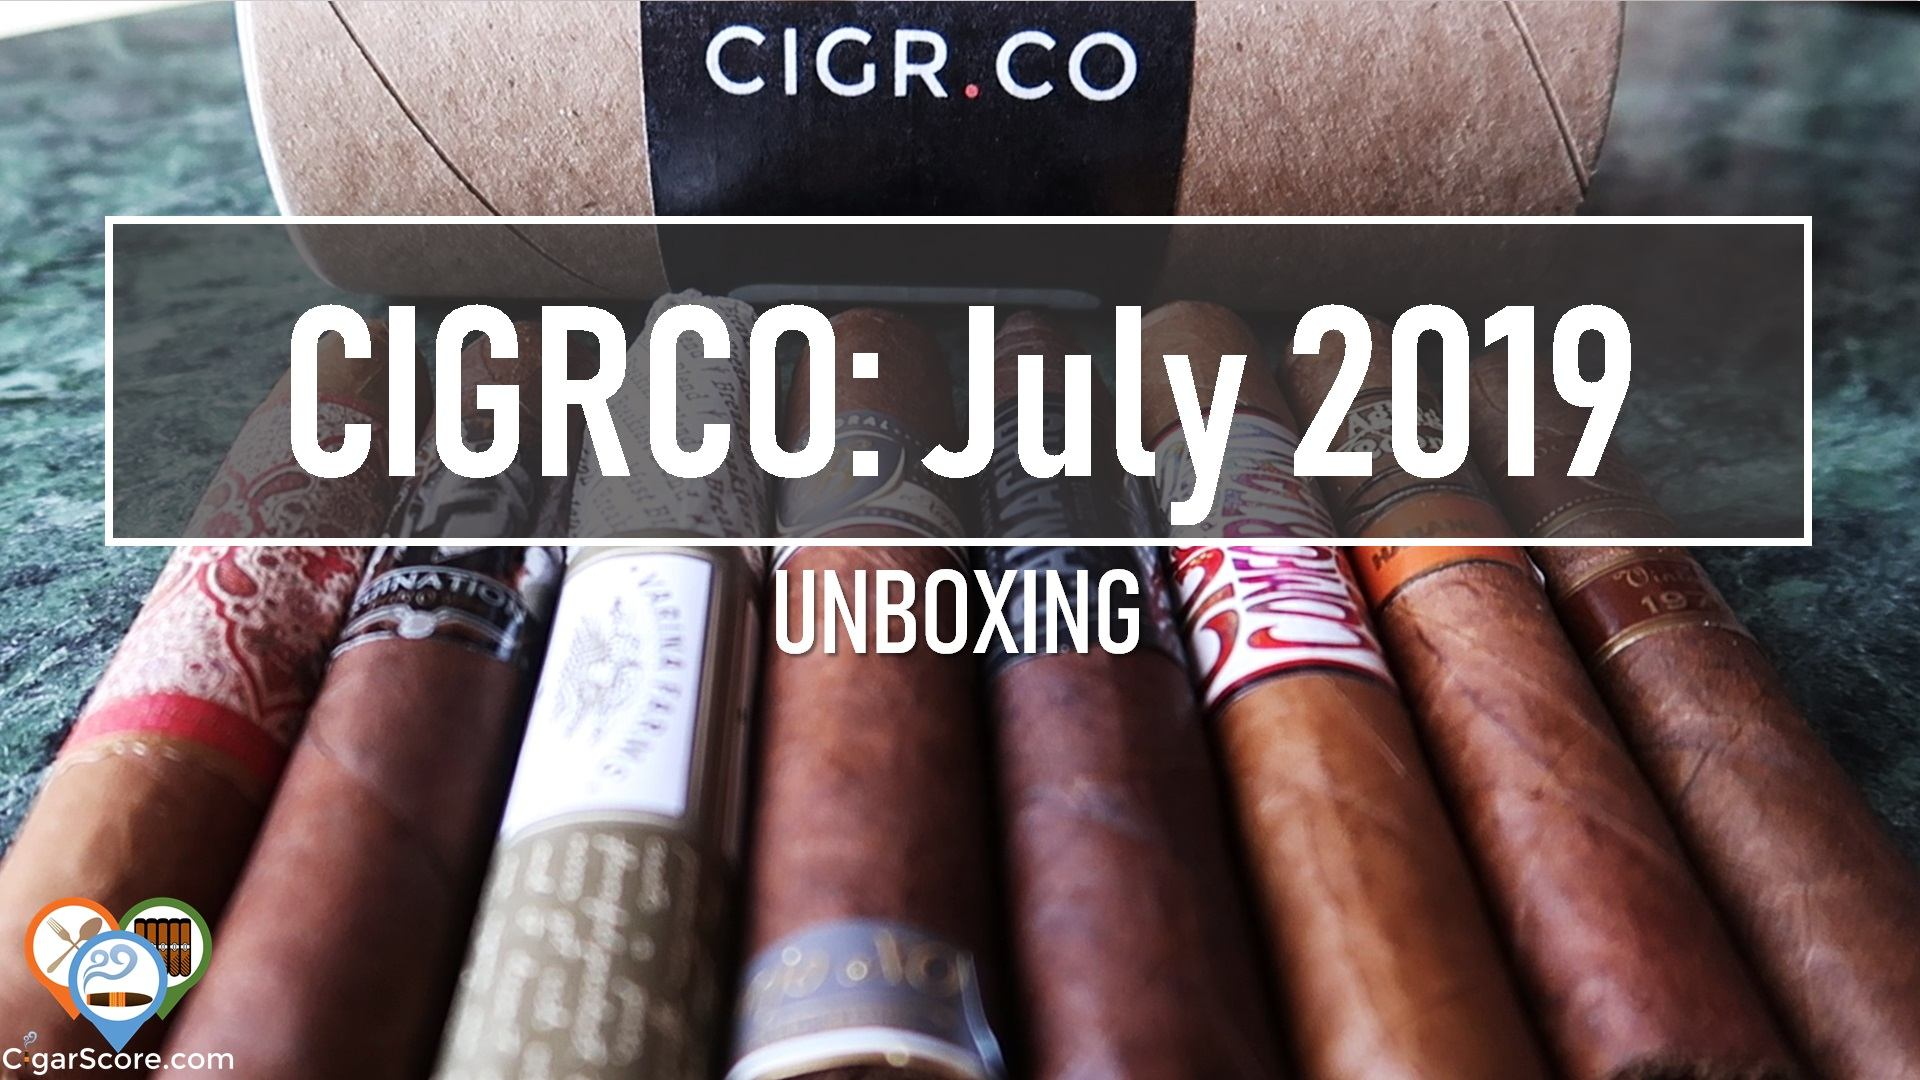 cigar subscription unboxing cigrco july 2019